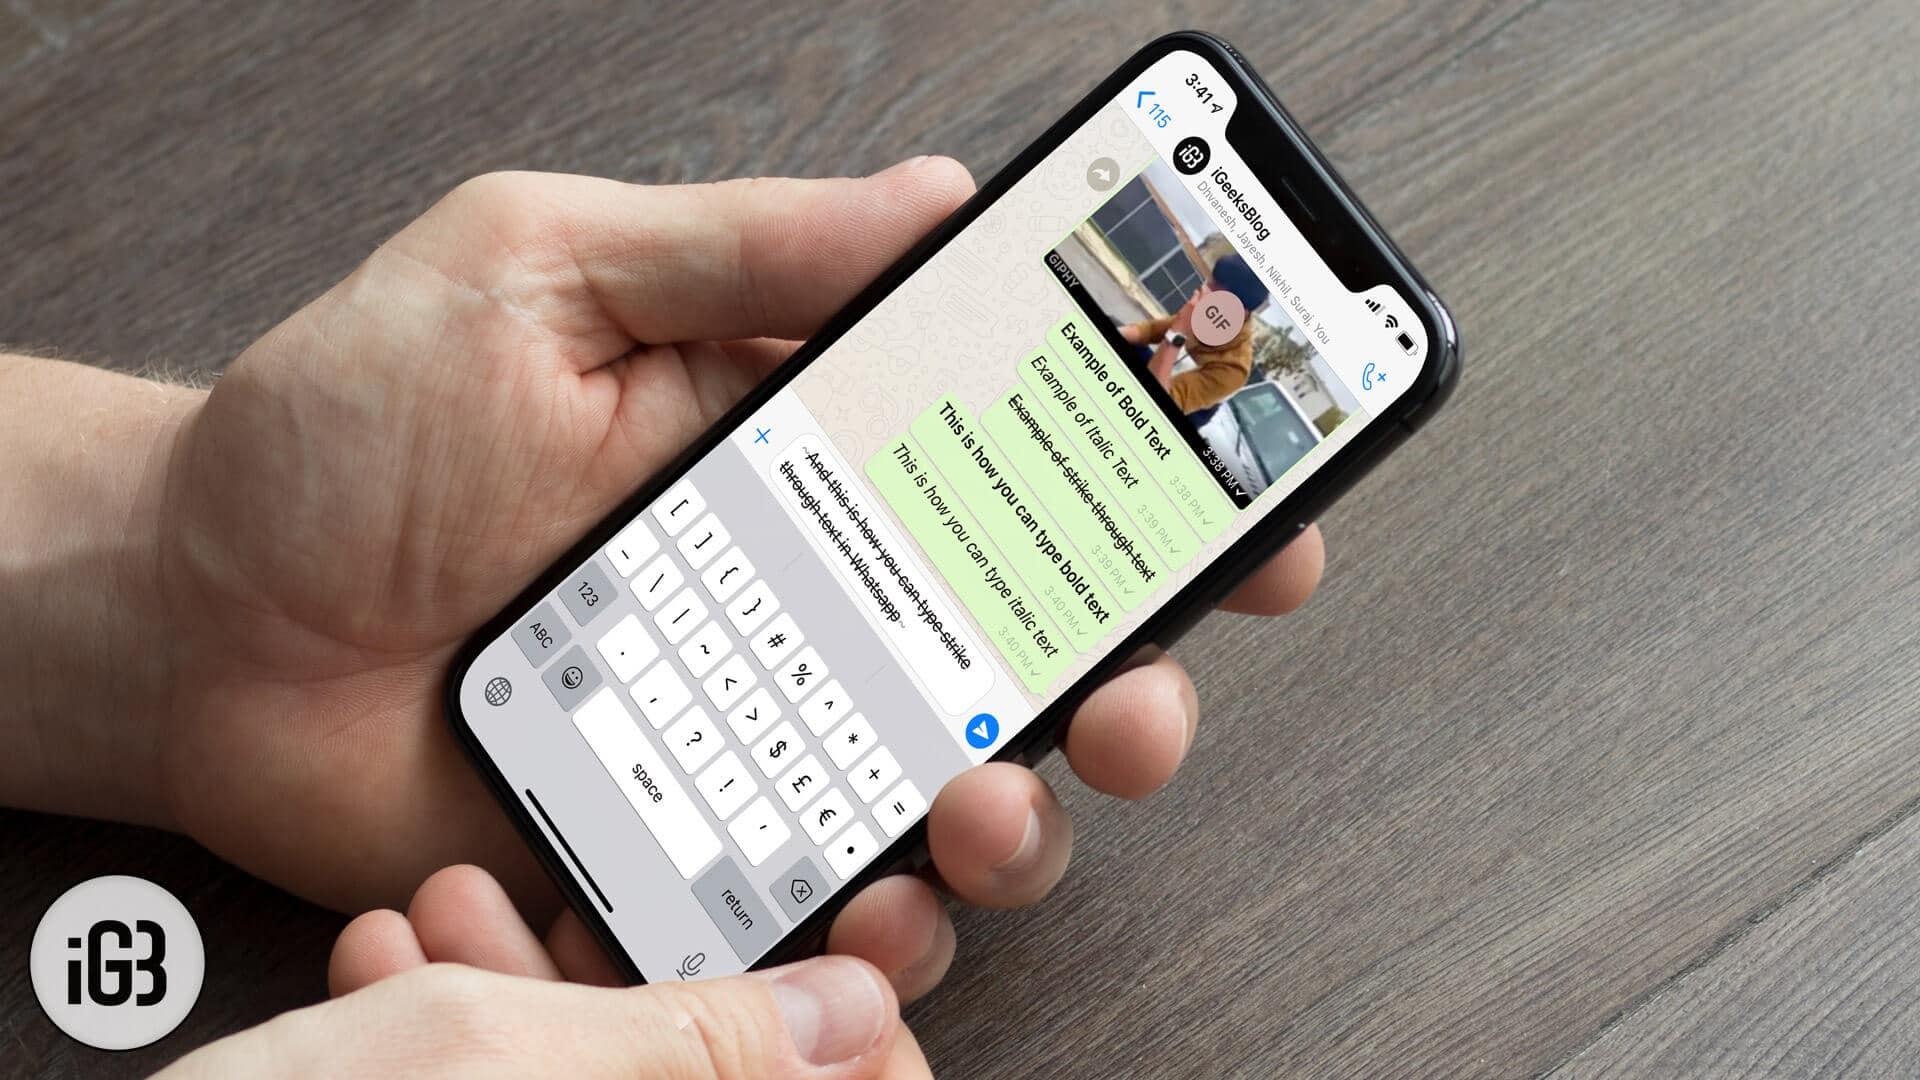 How To Write Bold Italic Strikethrough In Whatsapp On Iphone Igeeksblog